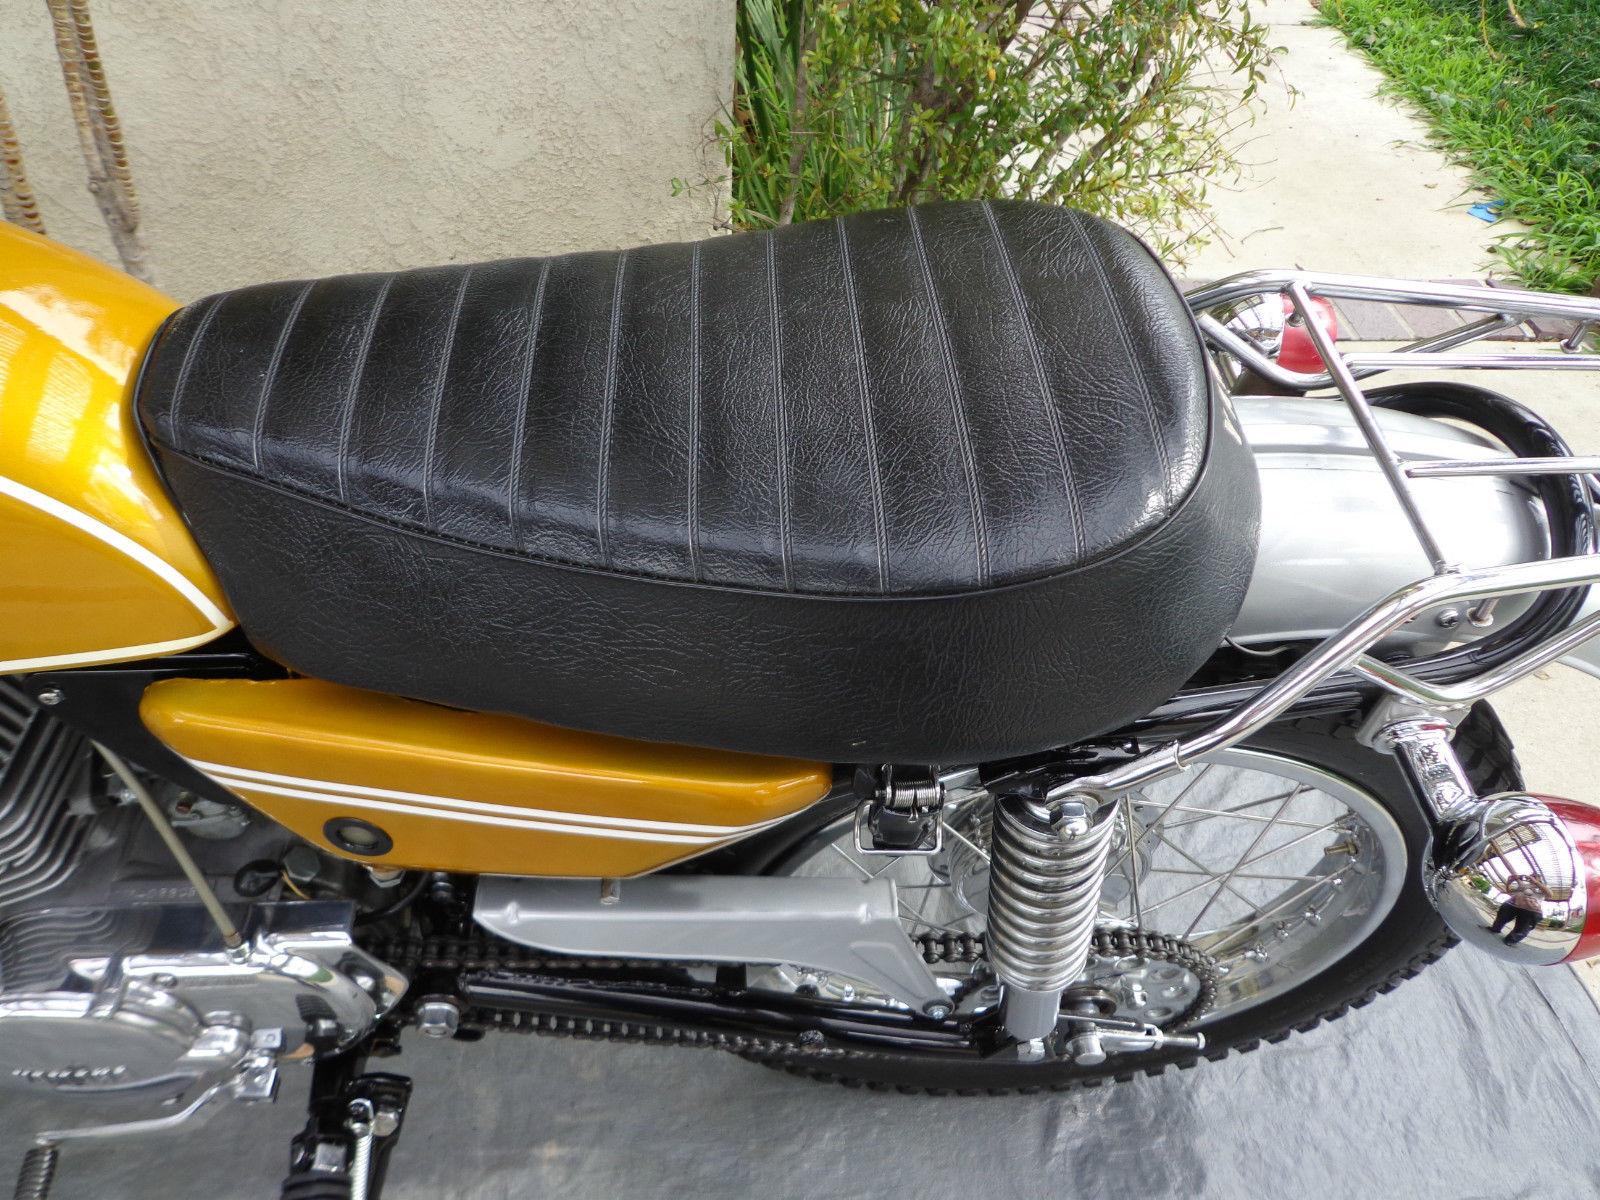 Yamaha CT1 175 Enduro - 1971 - Seat, Footrest and Side Panel.